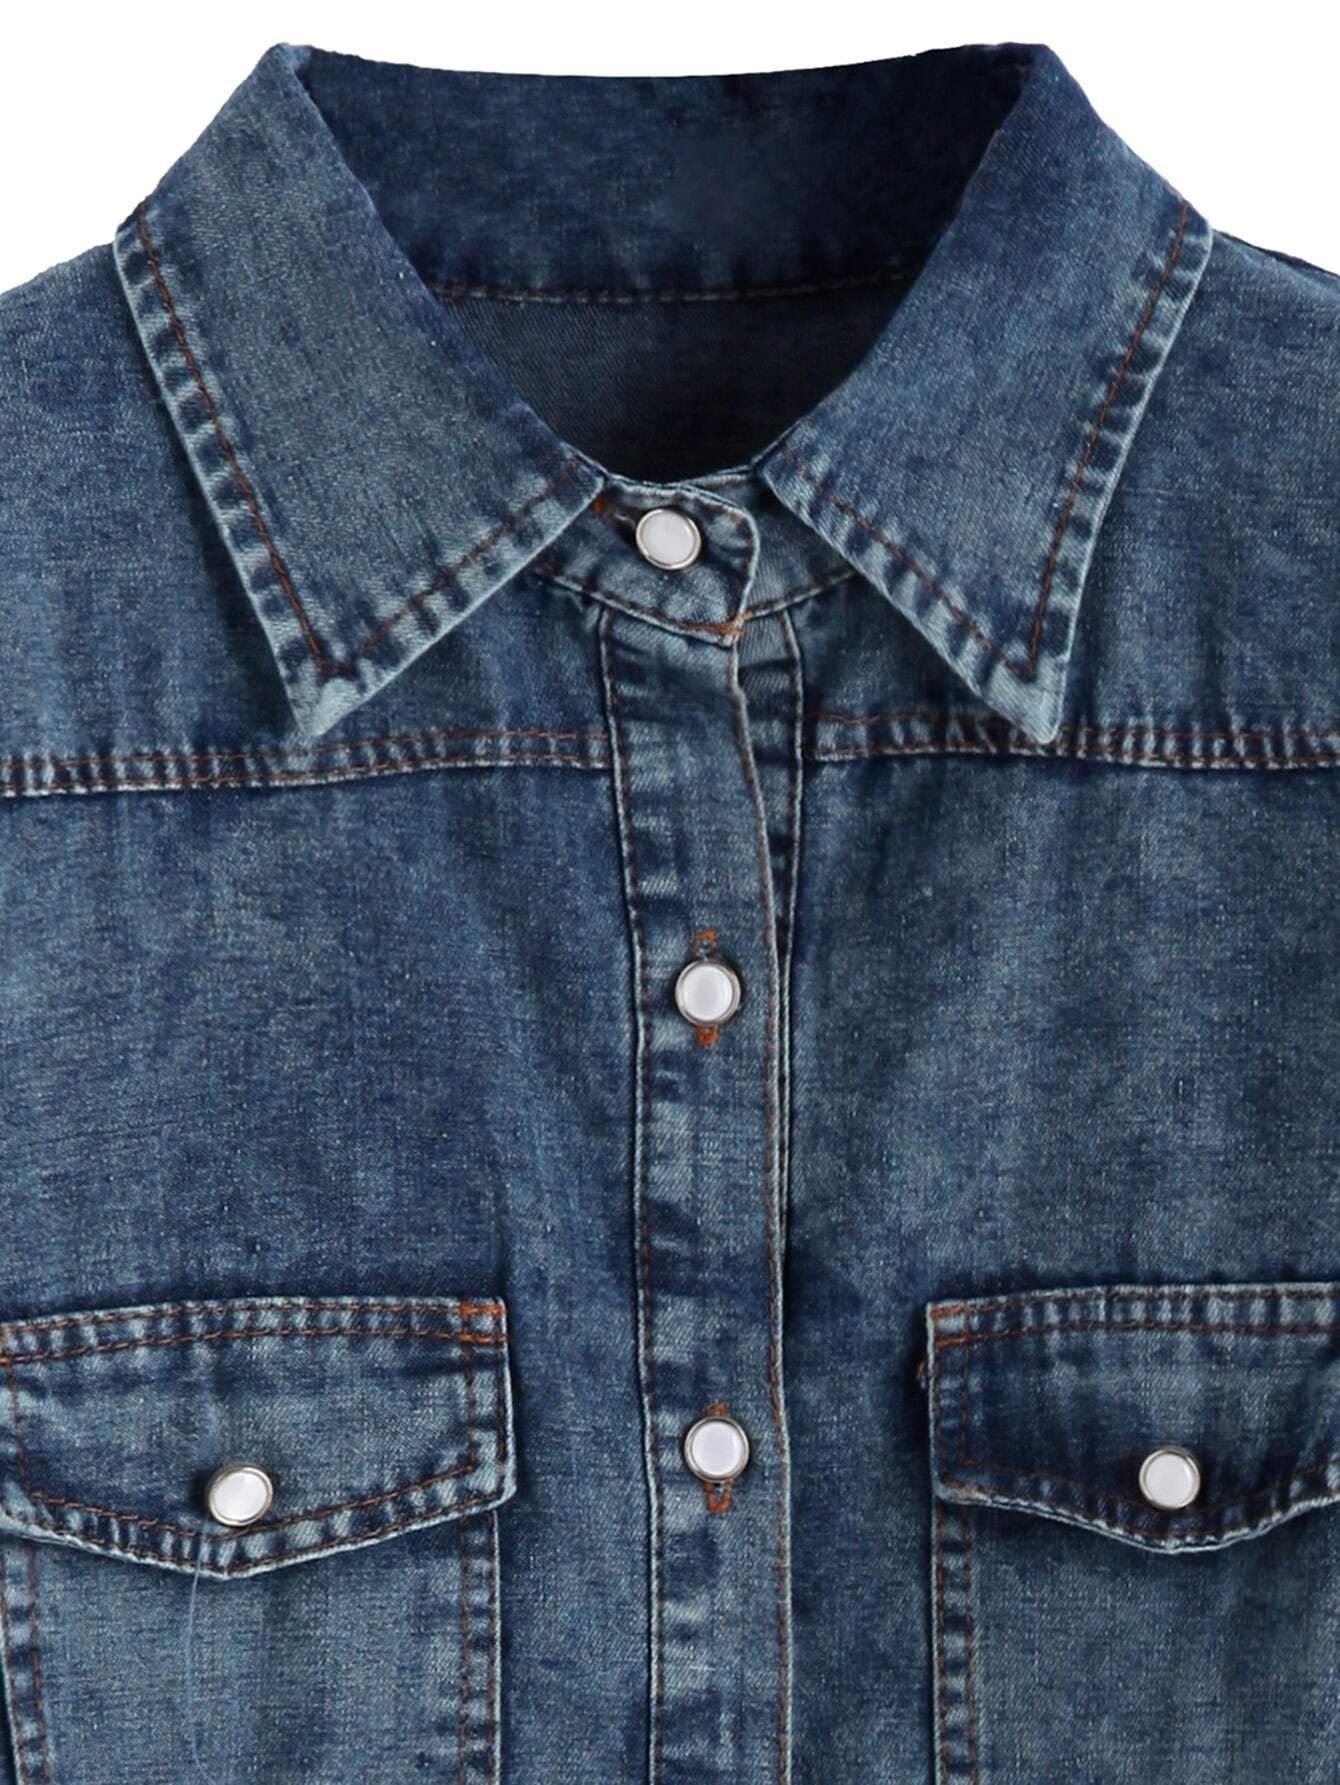 blouse160901121_2